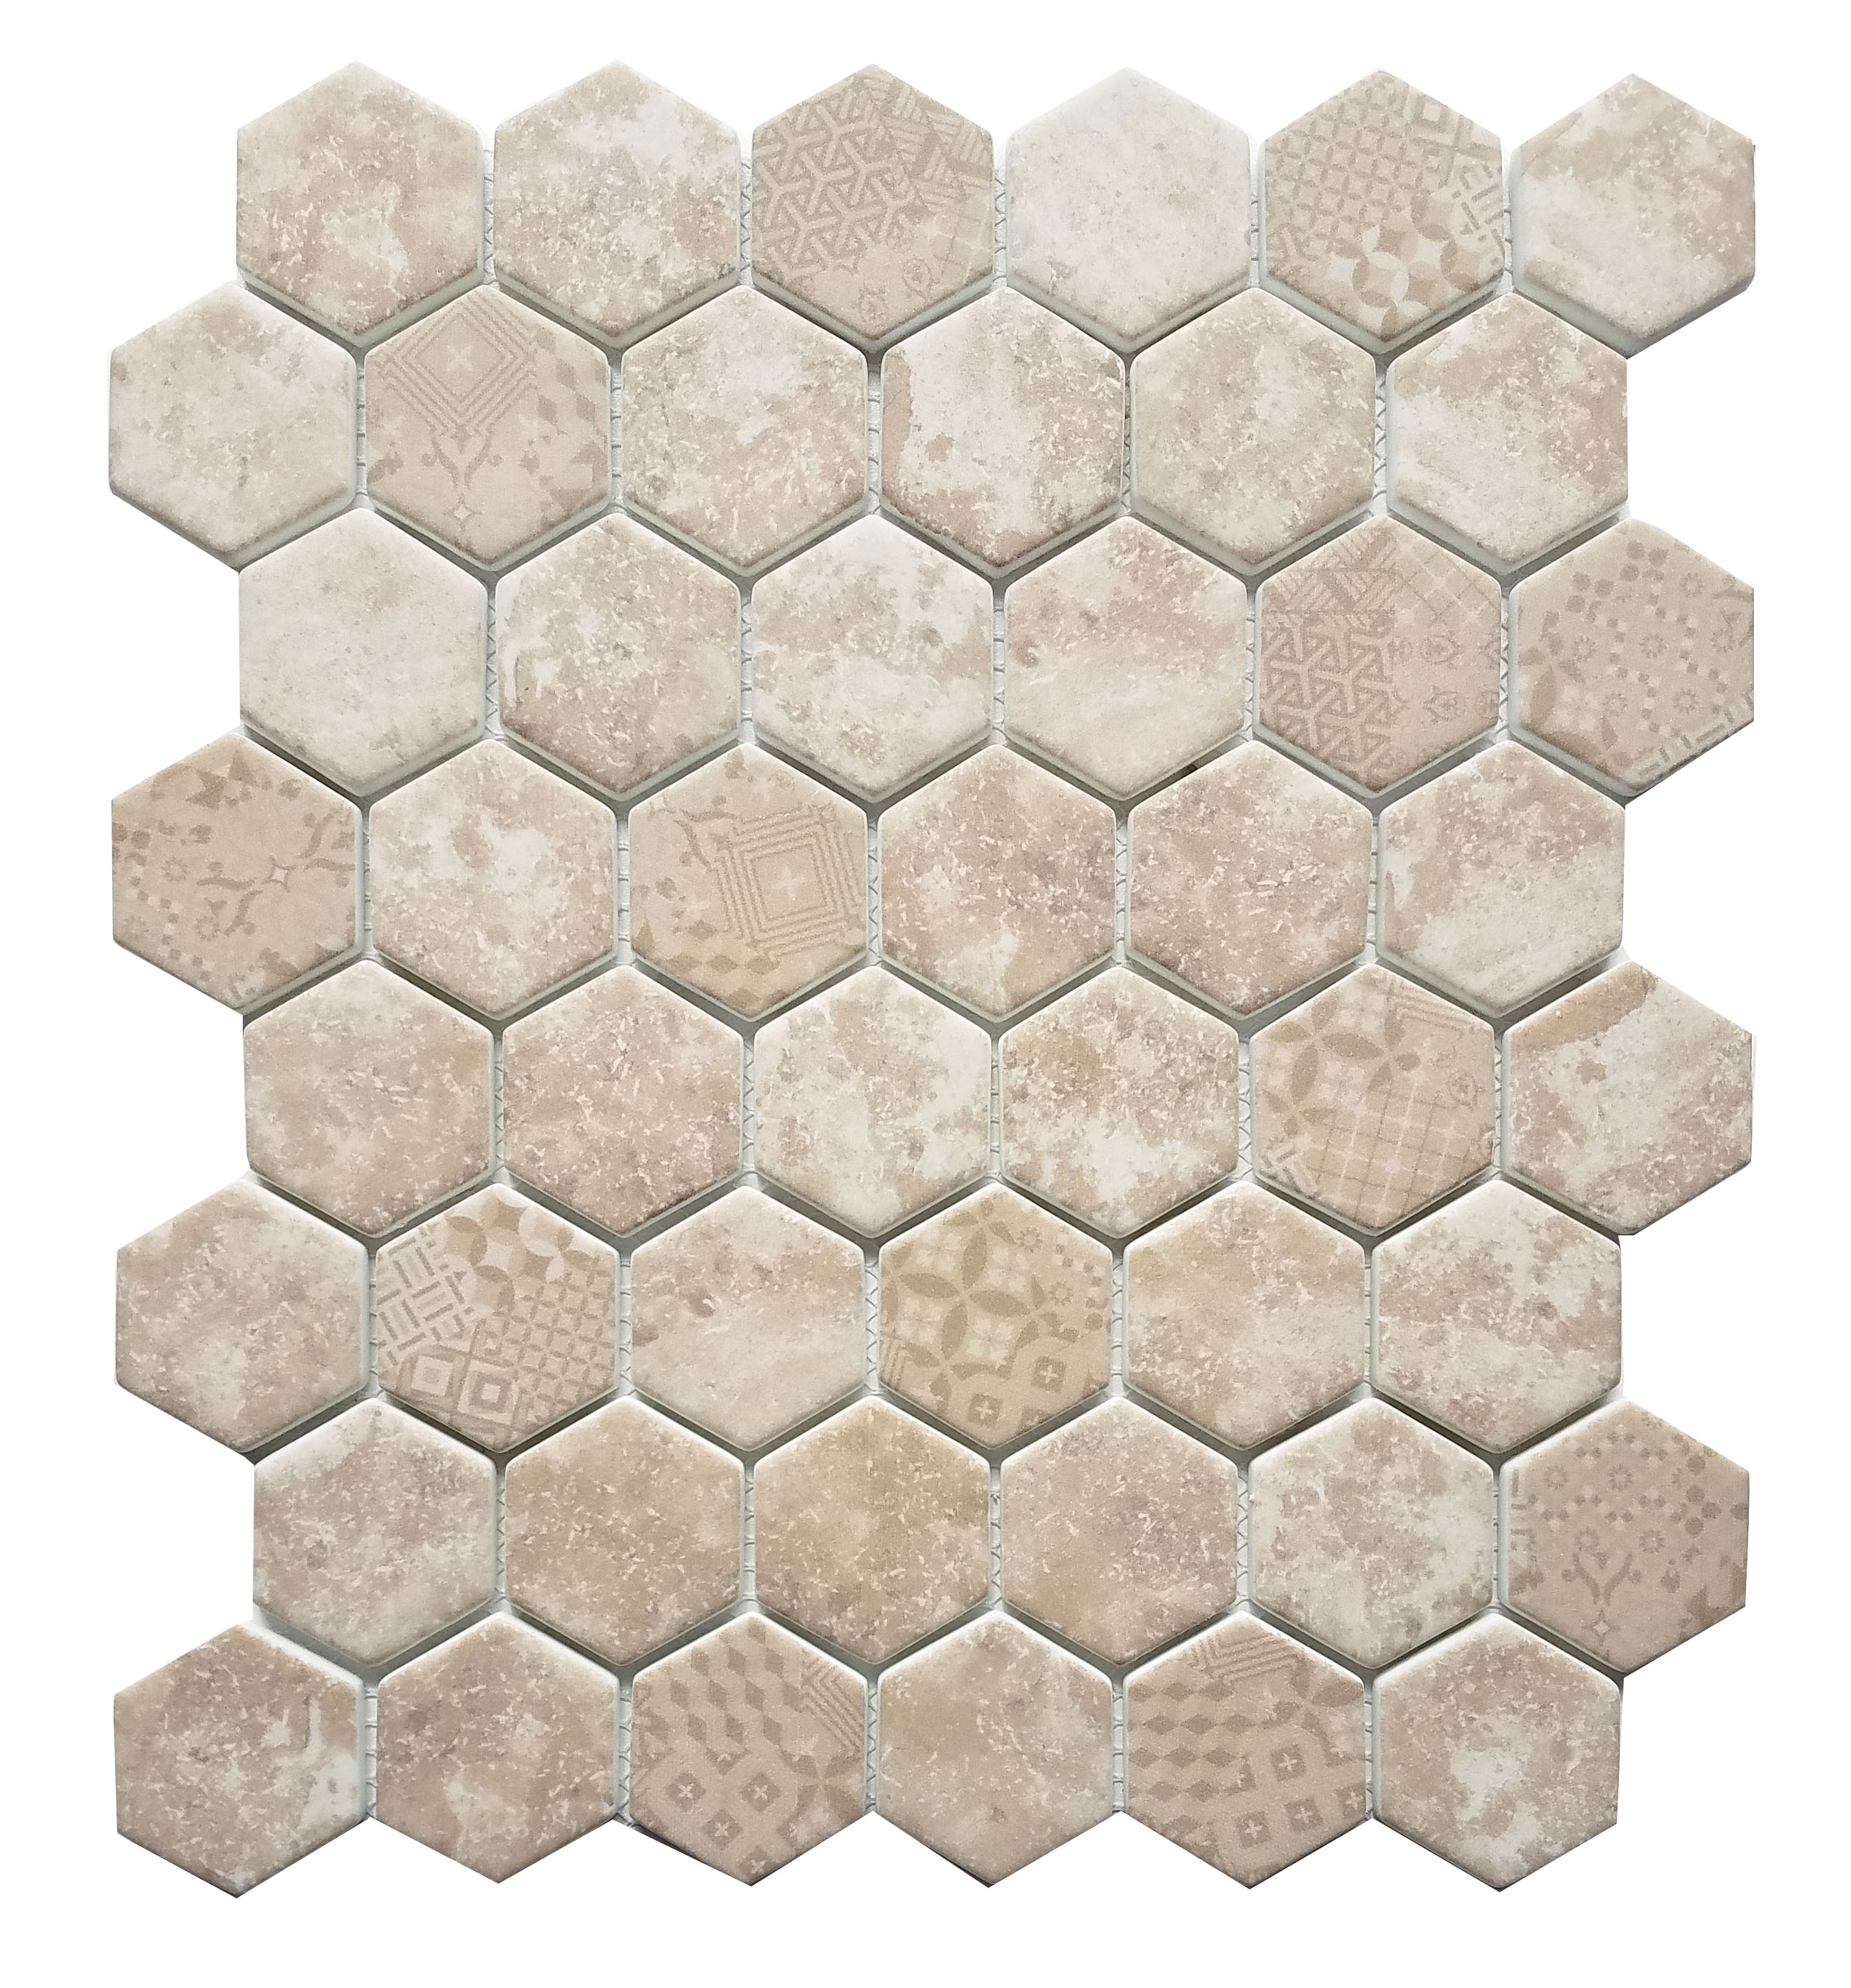 MA101-HX  2 x 2 Hexagon High density recycle glass